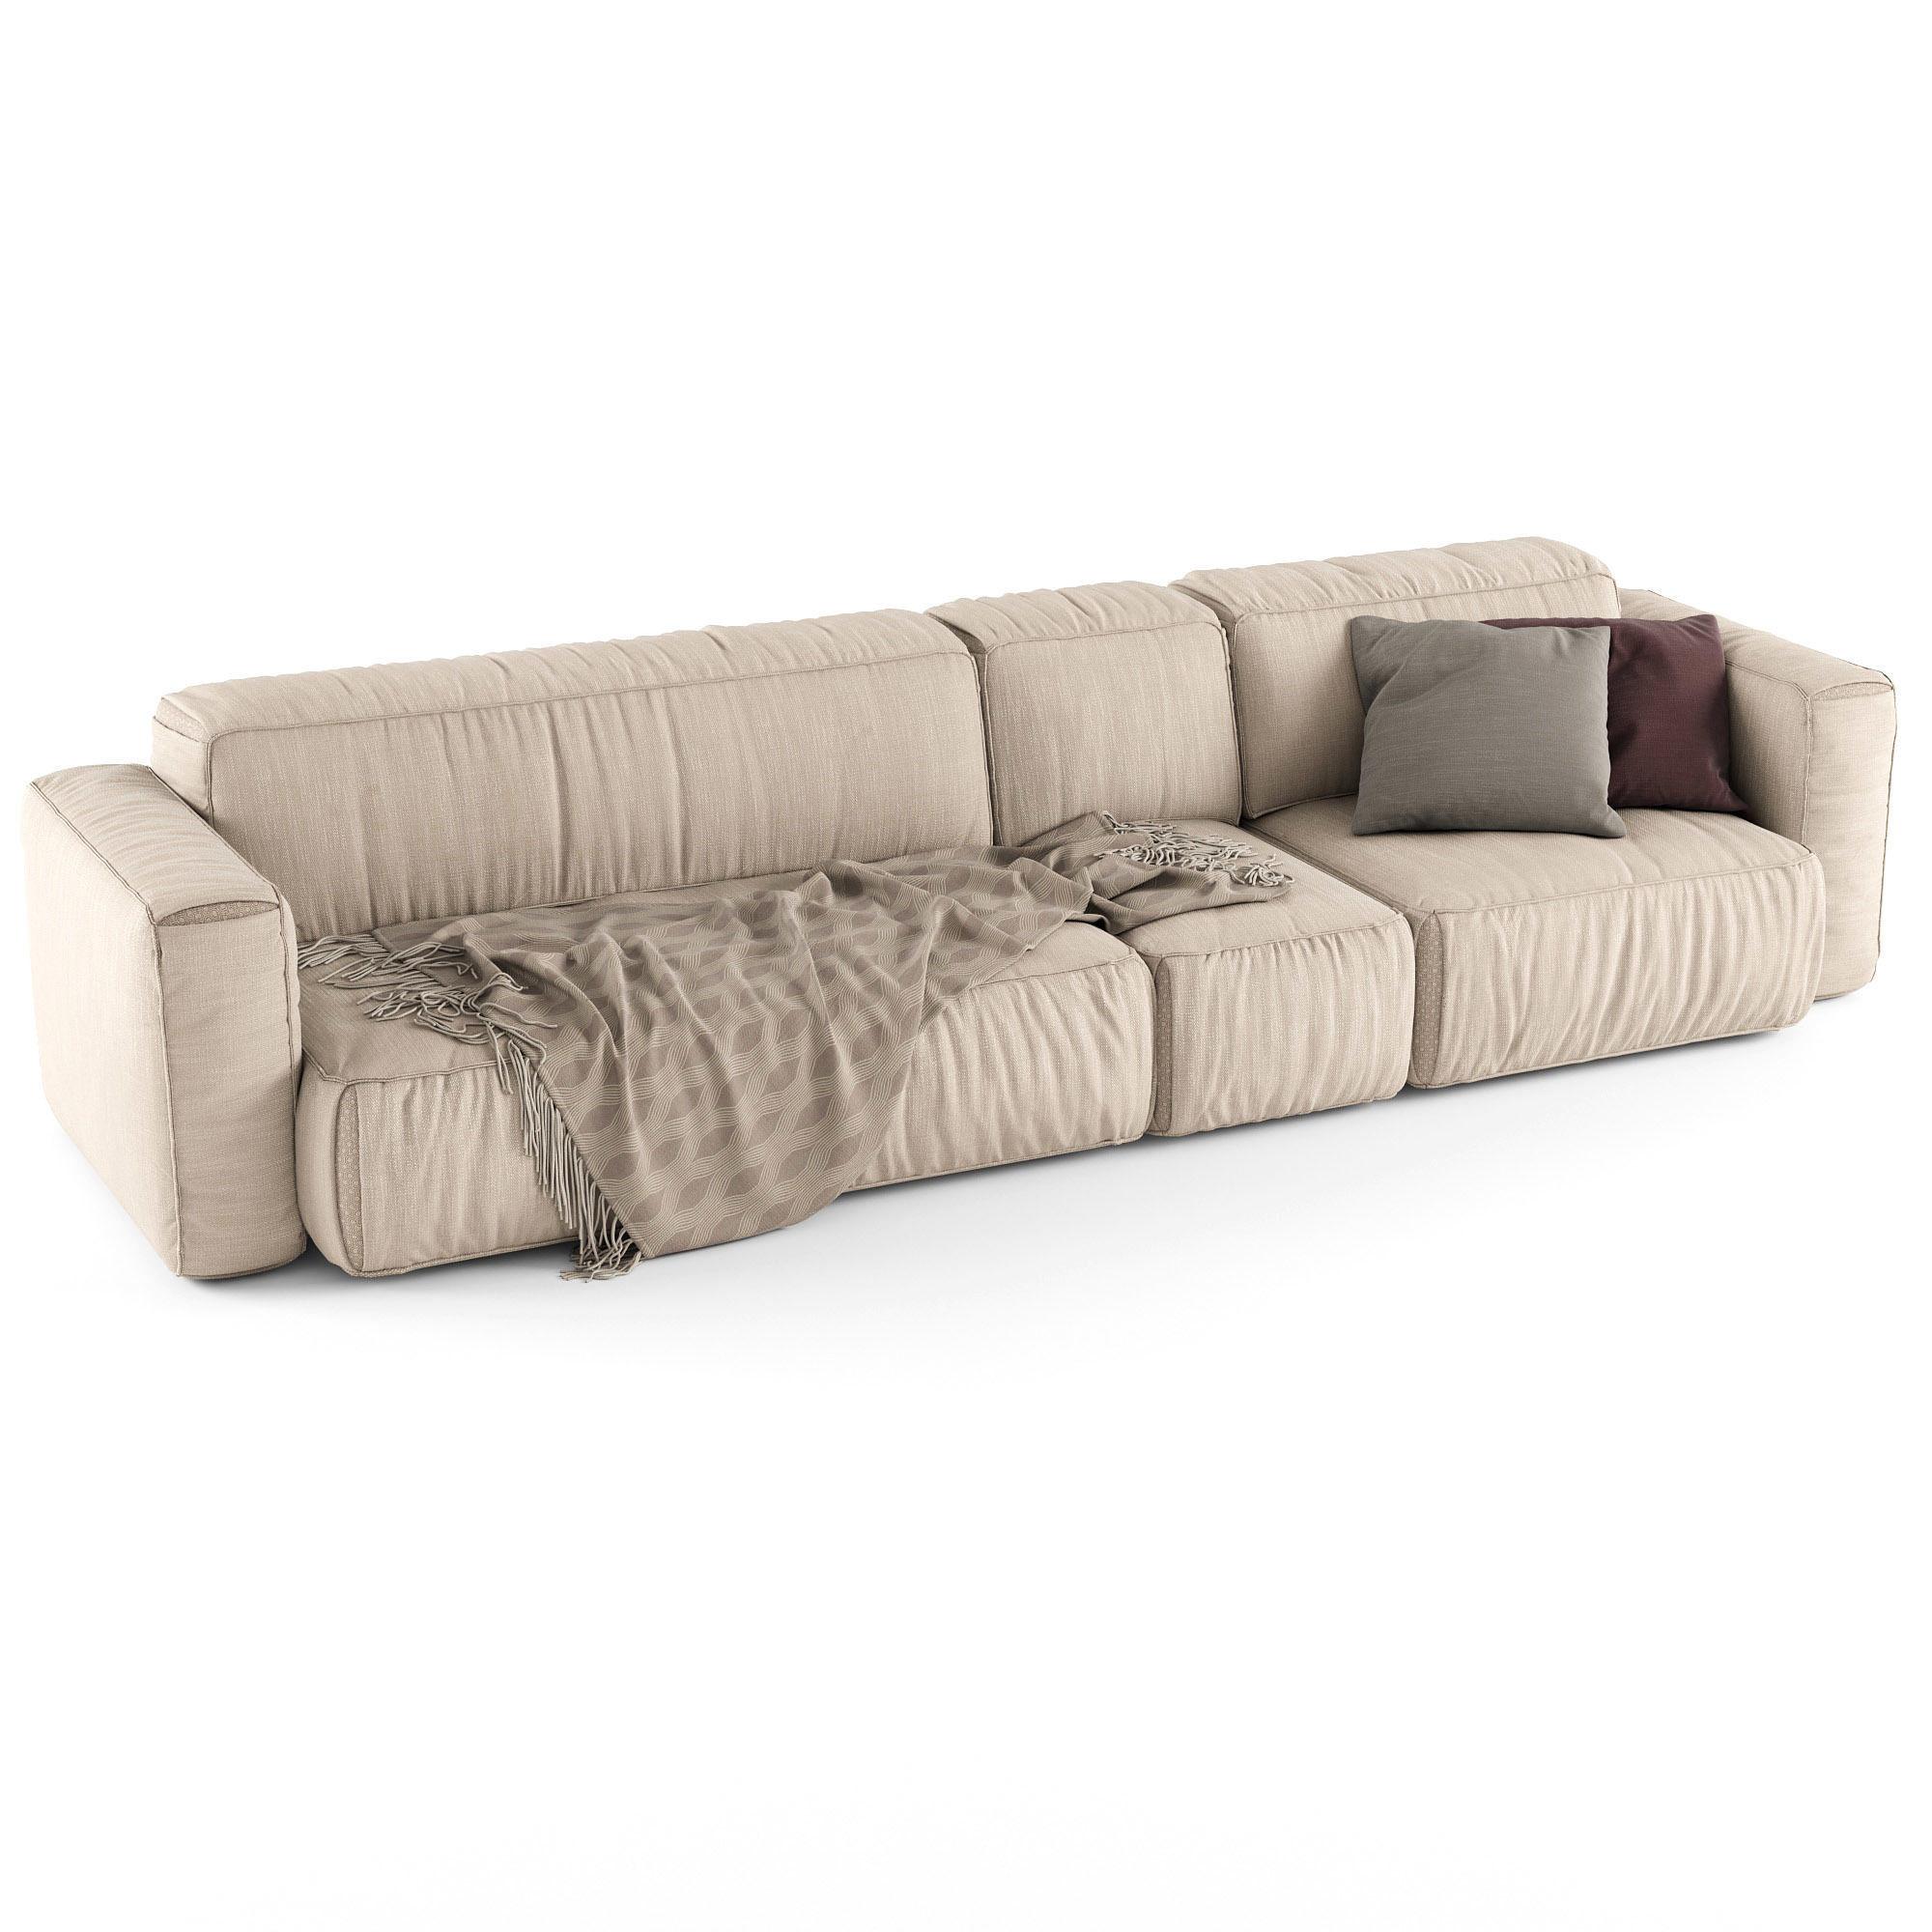 Koo International SOFT Sofa 2